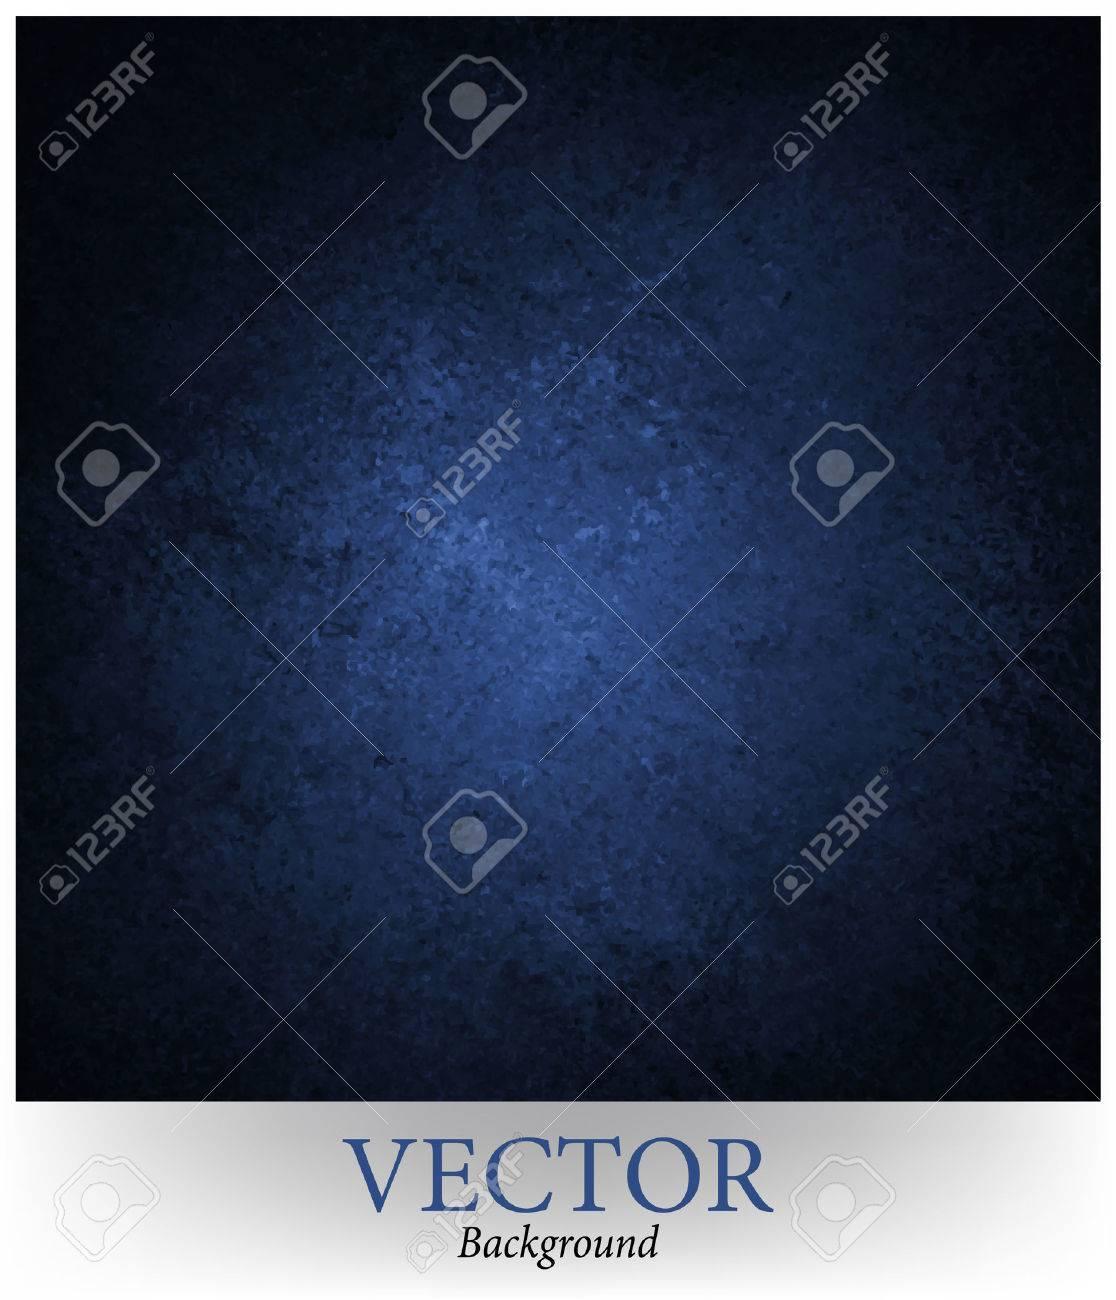 blue background vector, black vignette border and grunge texture Stock Vector - 34375123